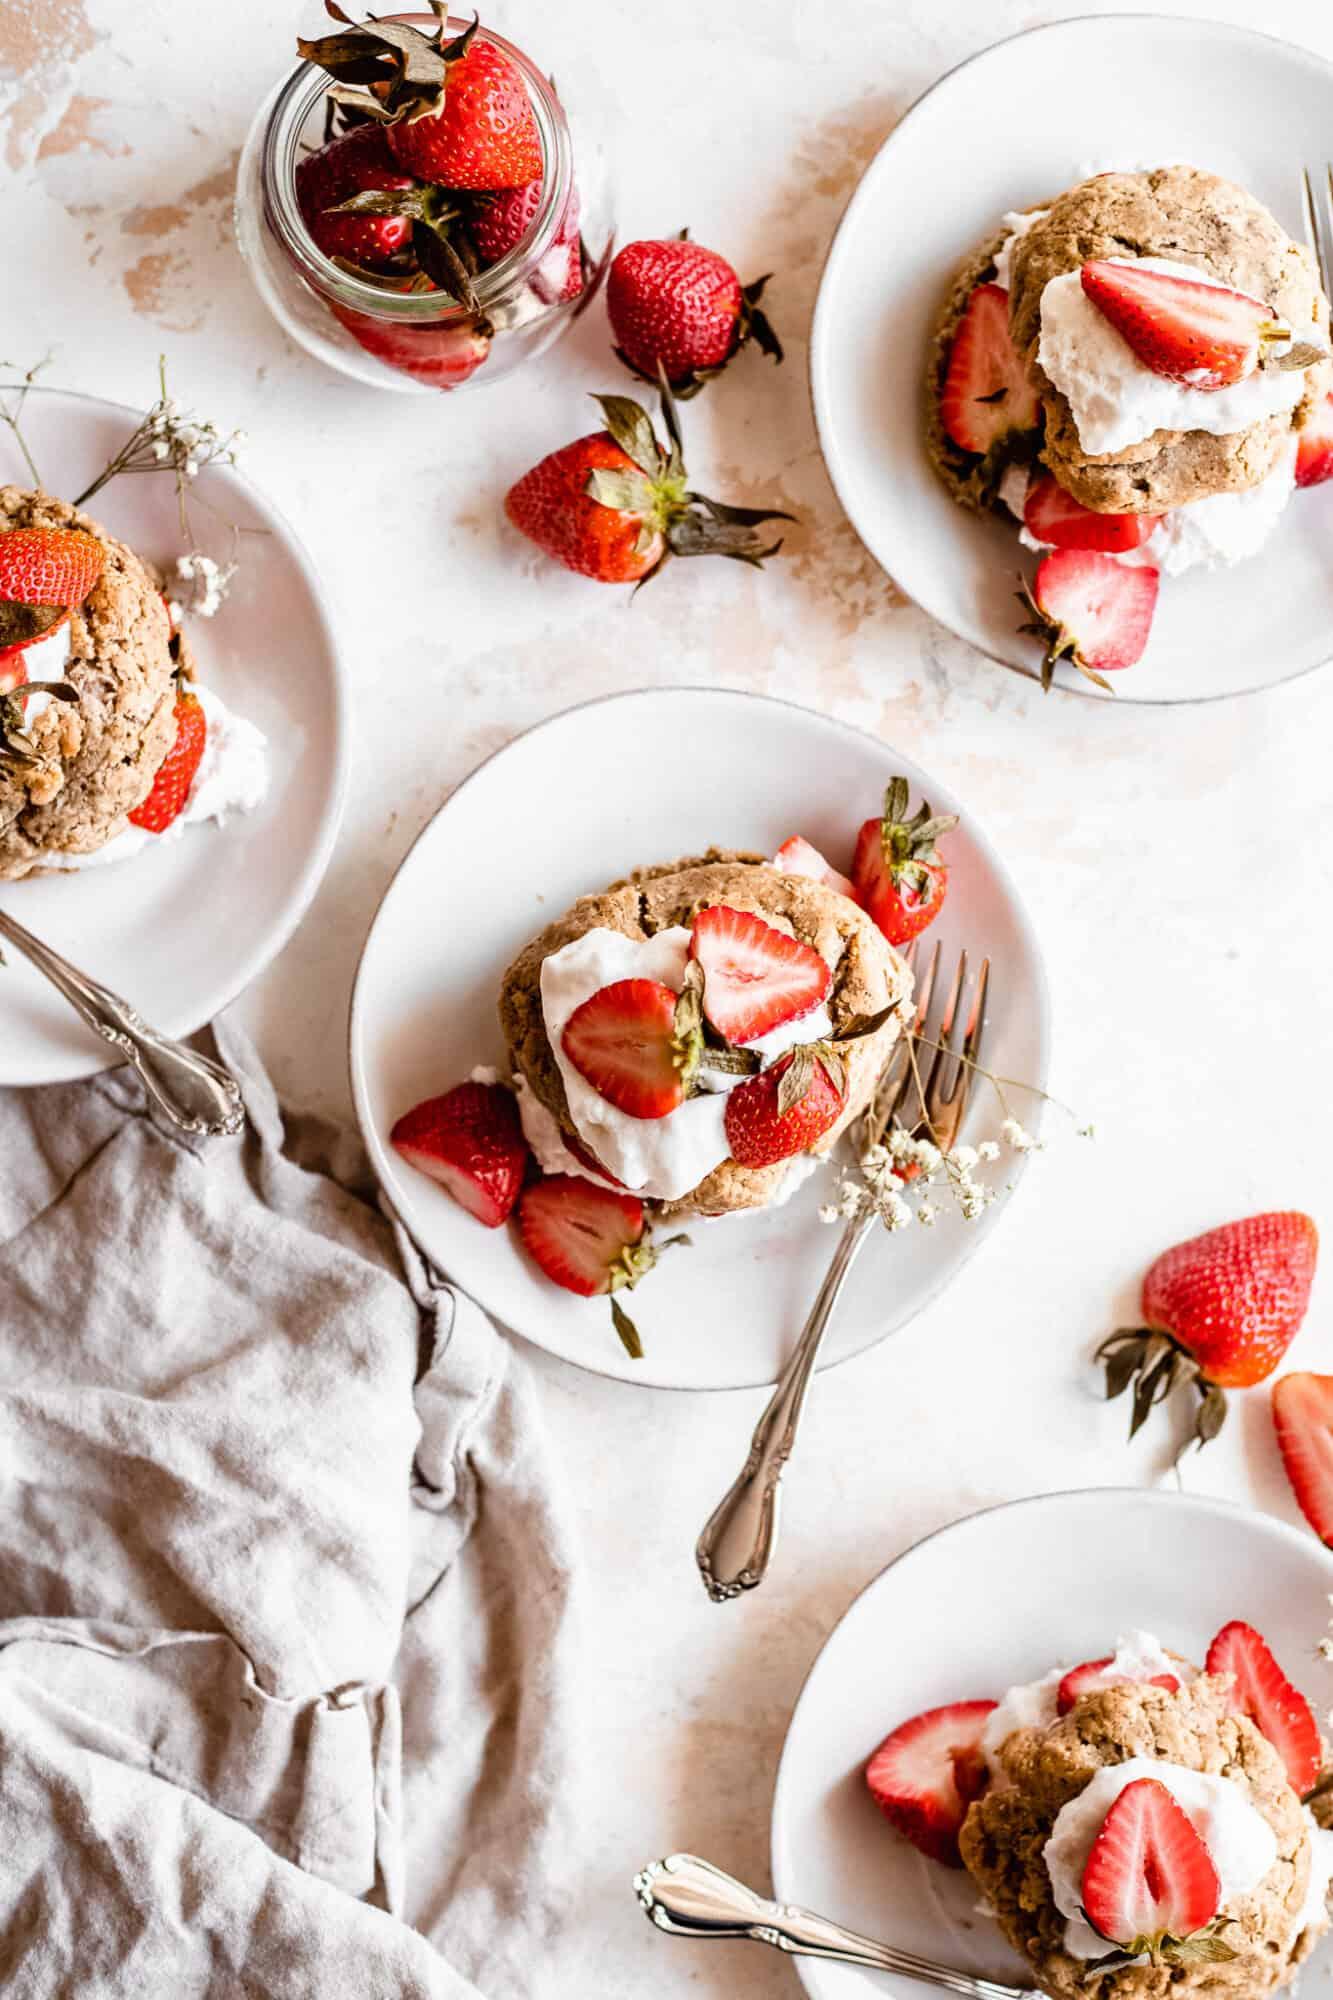 paleo strawberry shortcakes on plate